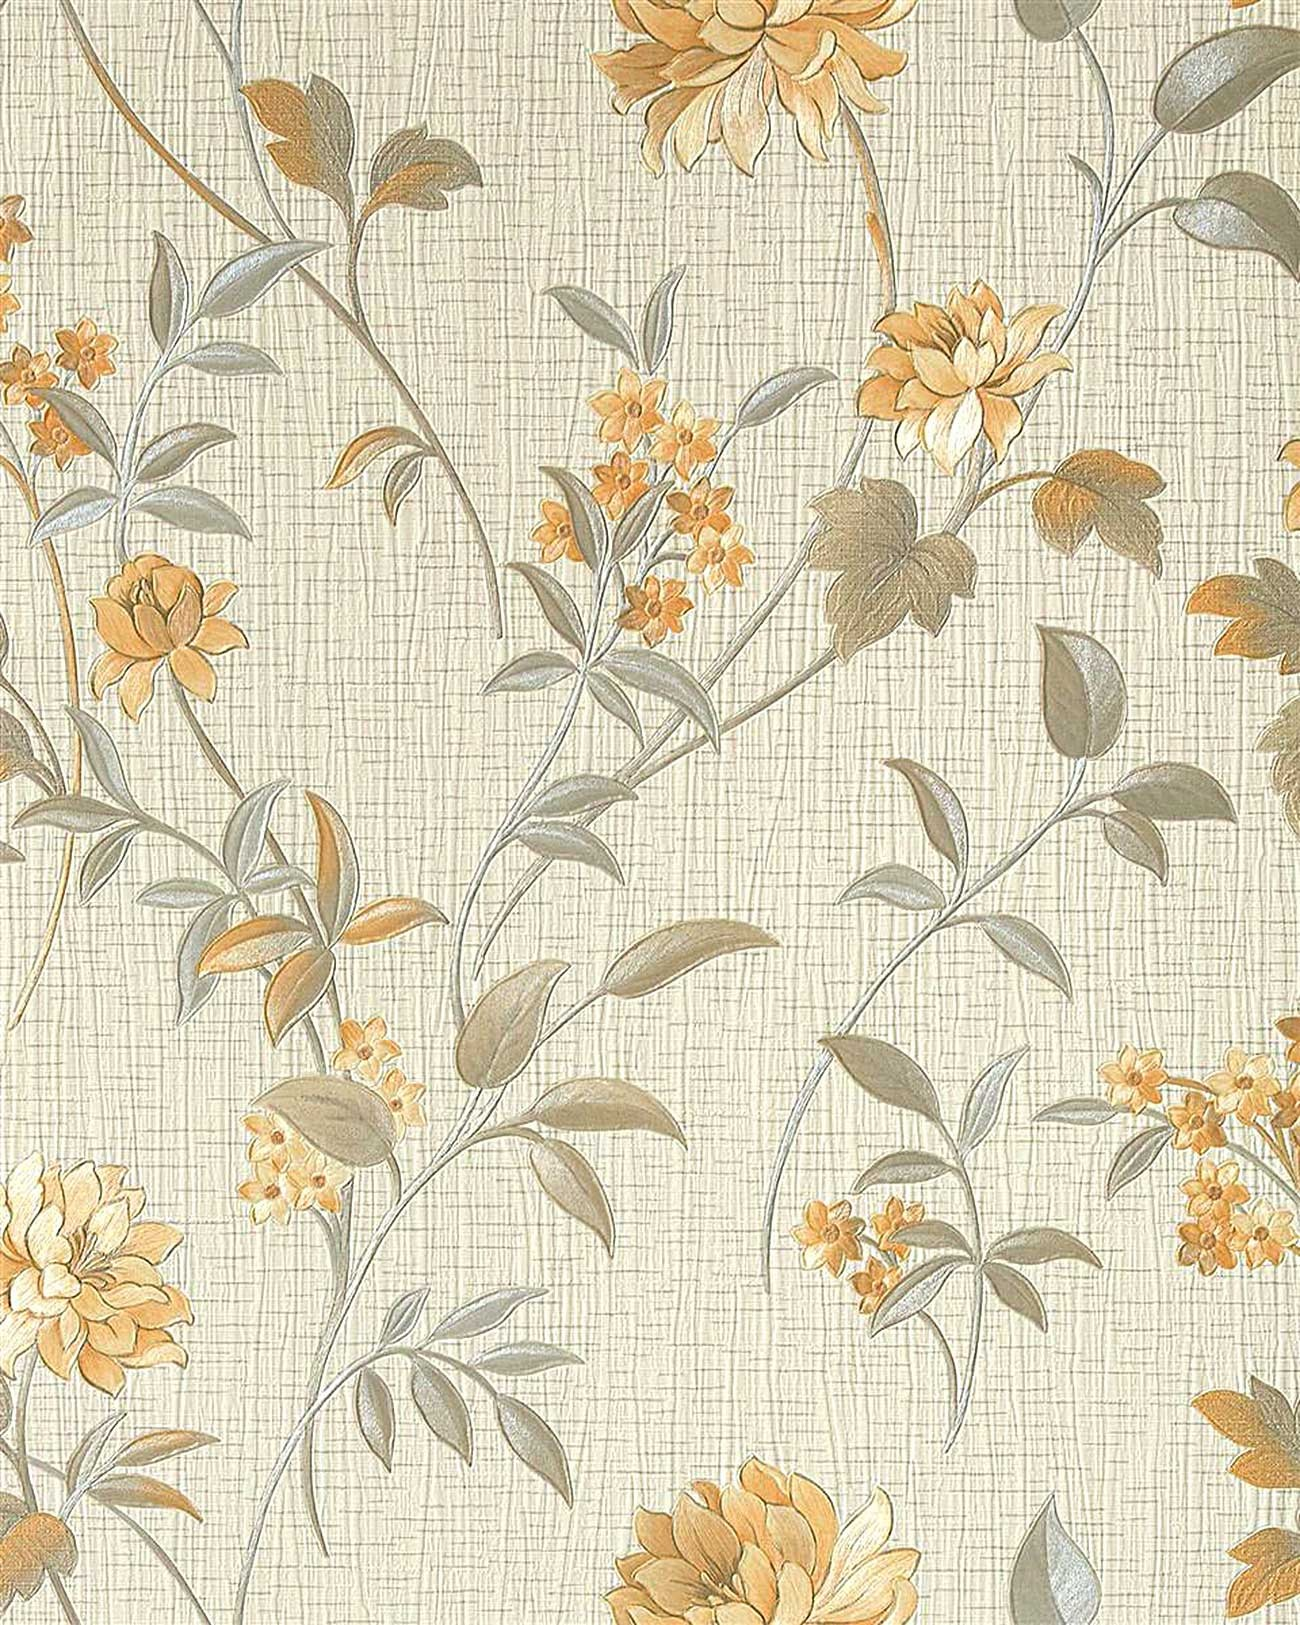 asia tapete edem 751 32 asiatischetapete deluxe asia floral blumentapete beige creme gold gelb. Black Bedroom Furniture Sets. Home Design Ideas